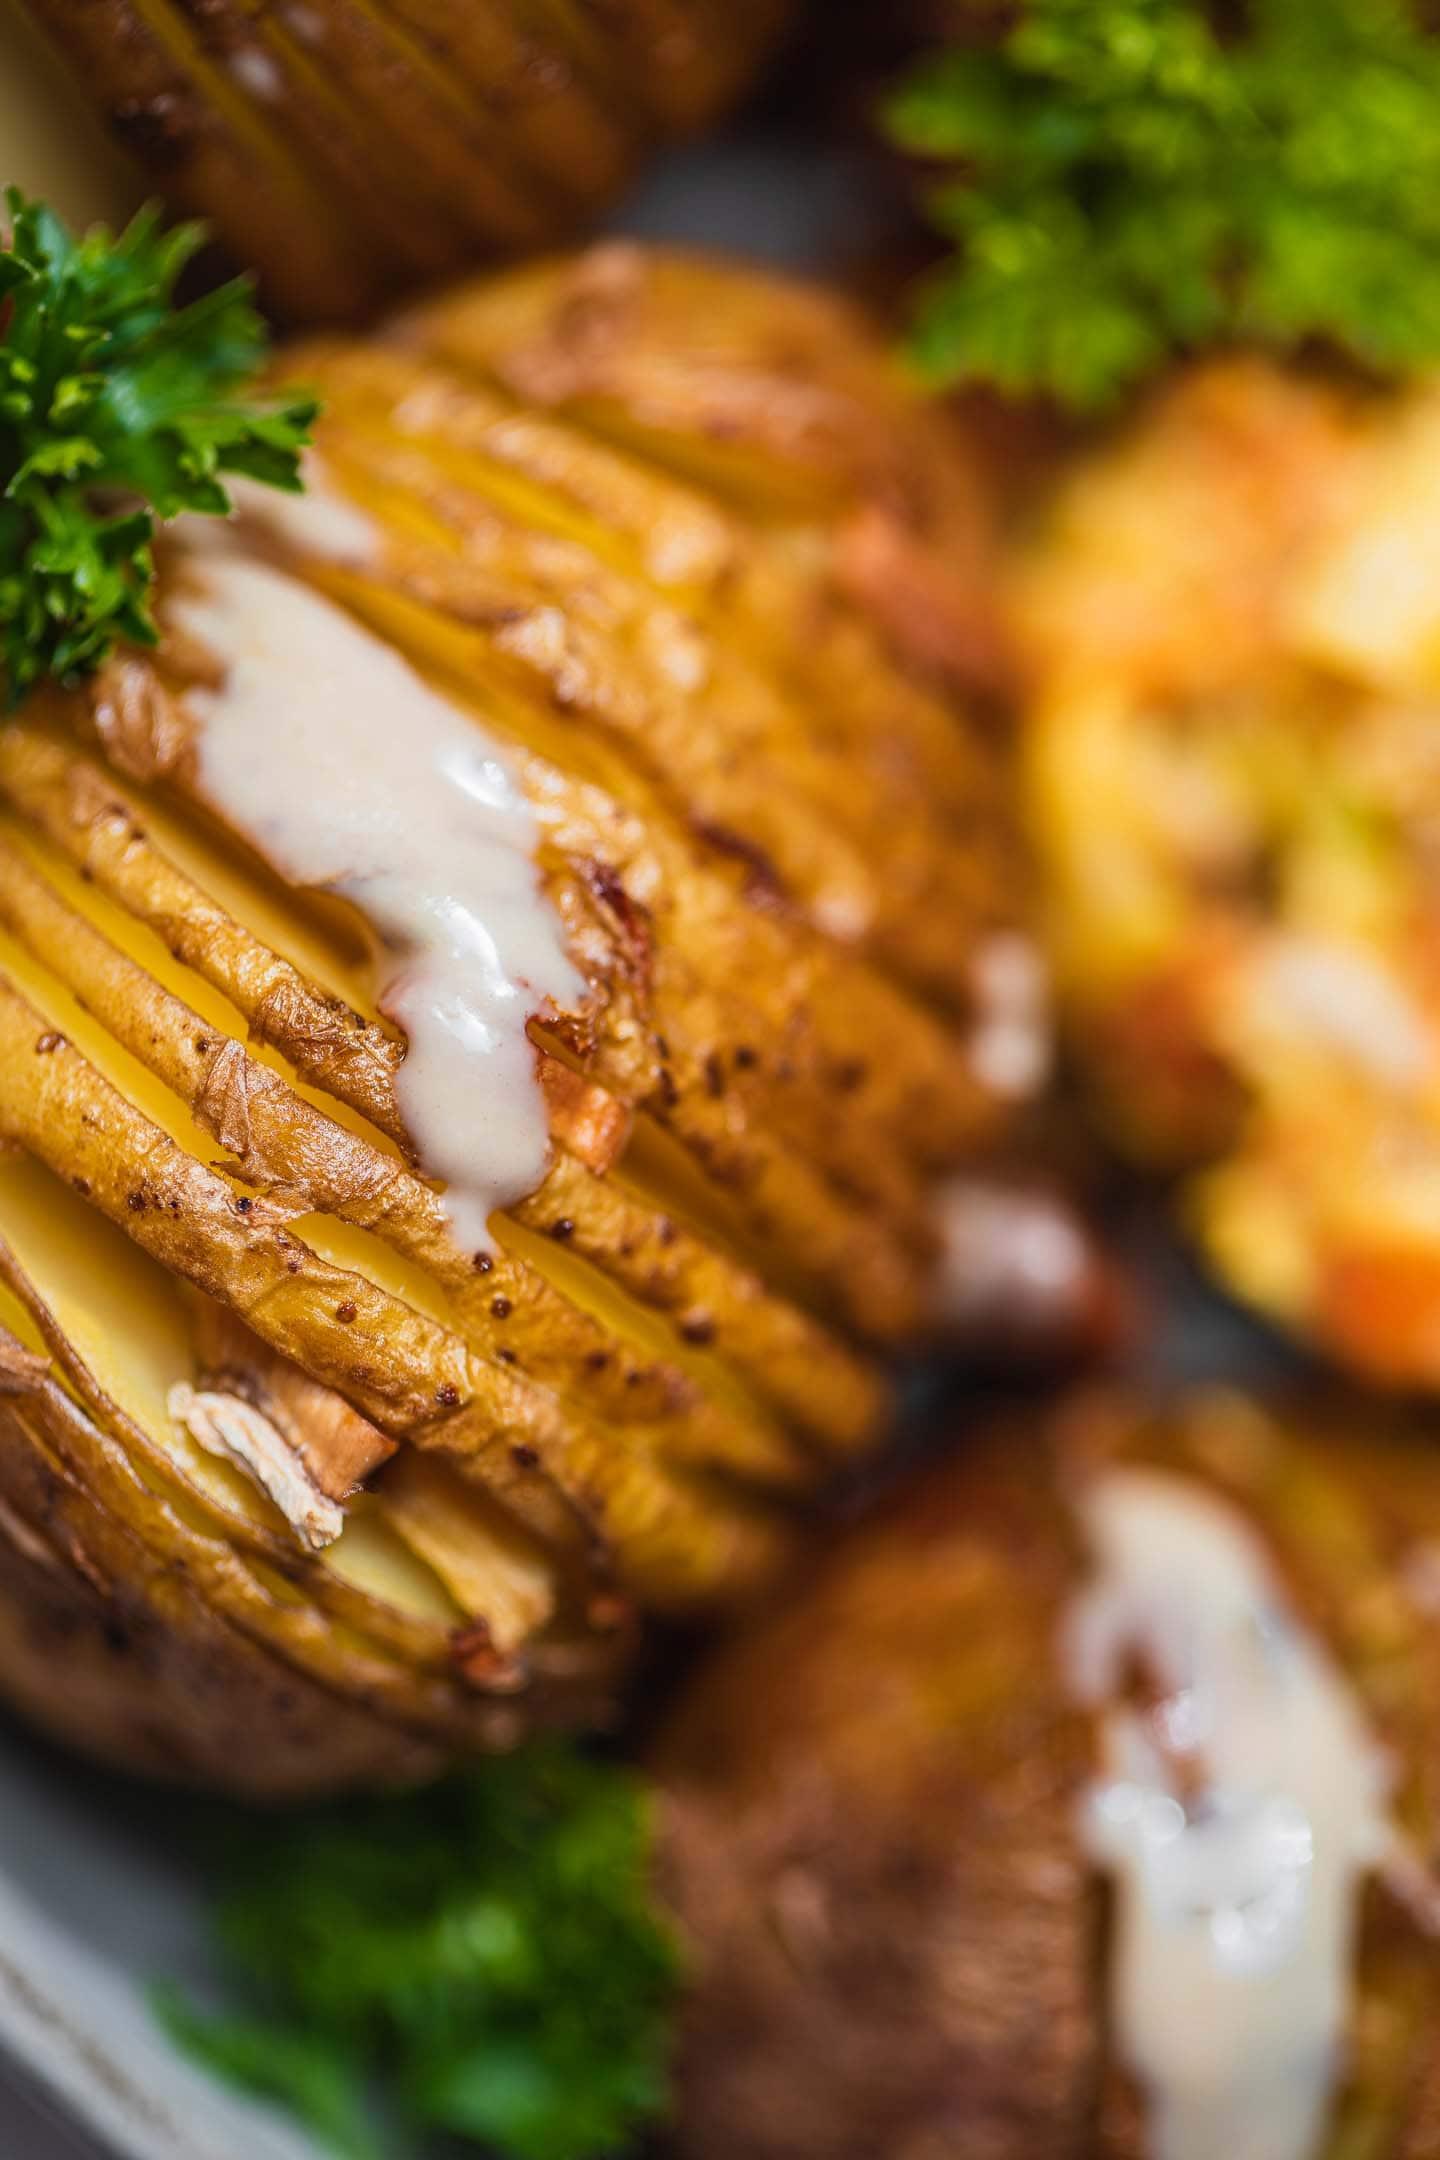 Vegan hasselback potatoes with avocado saucee